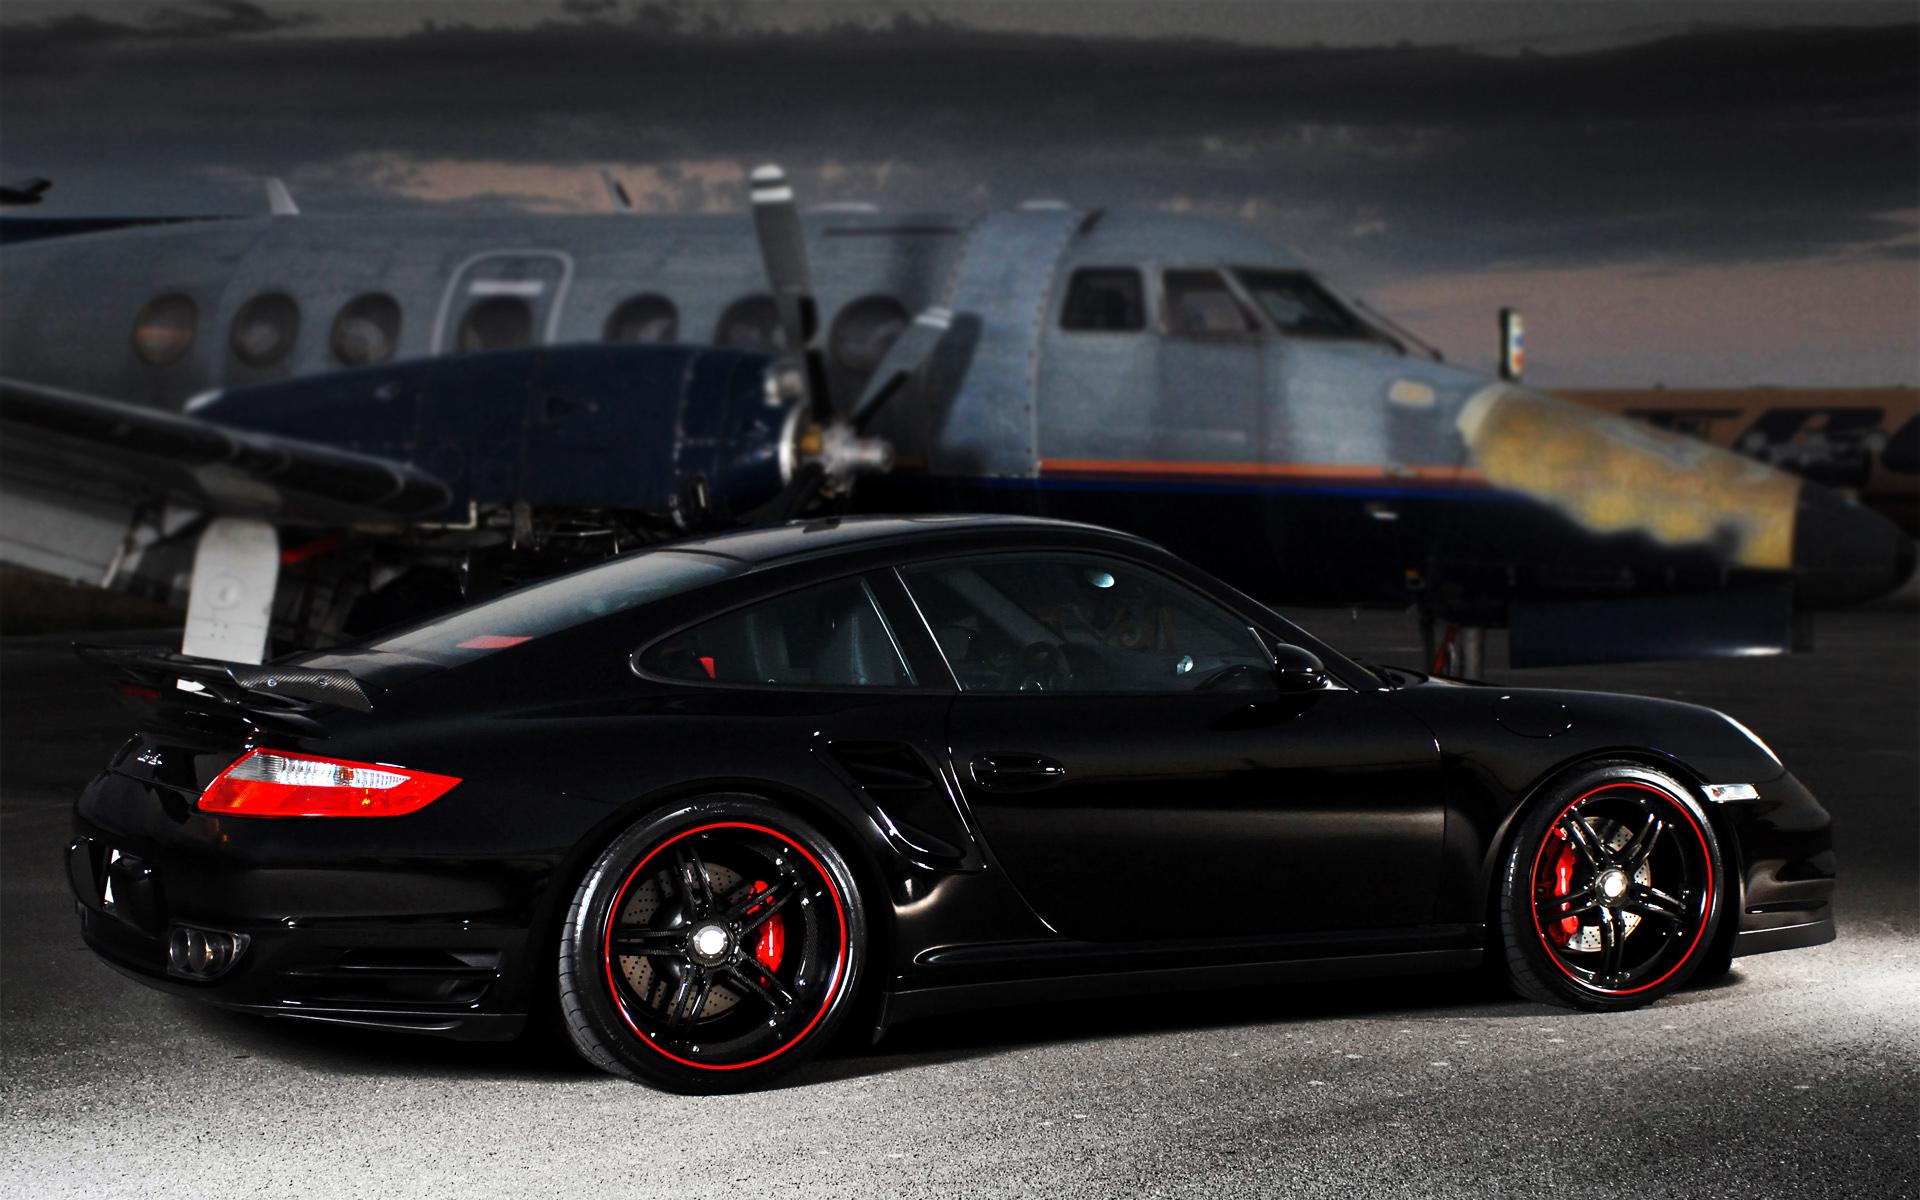 Porsche 911 Turbo Black Super Cars HD Wallpapers 1920x1200